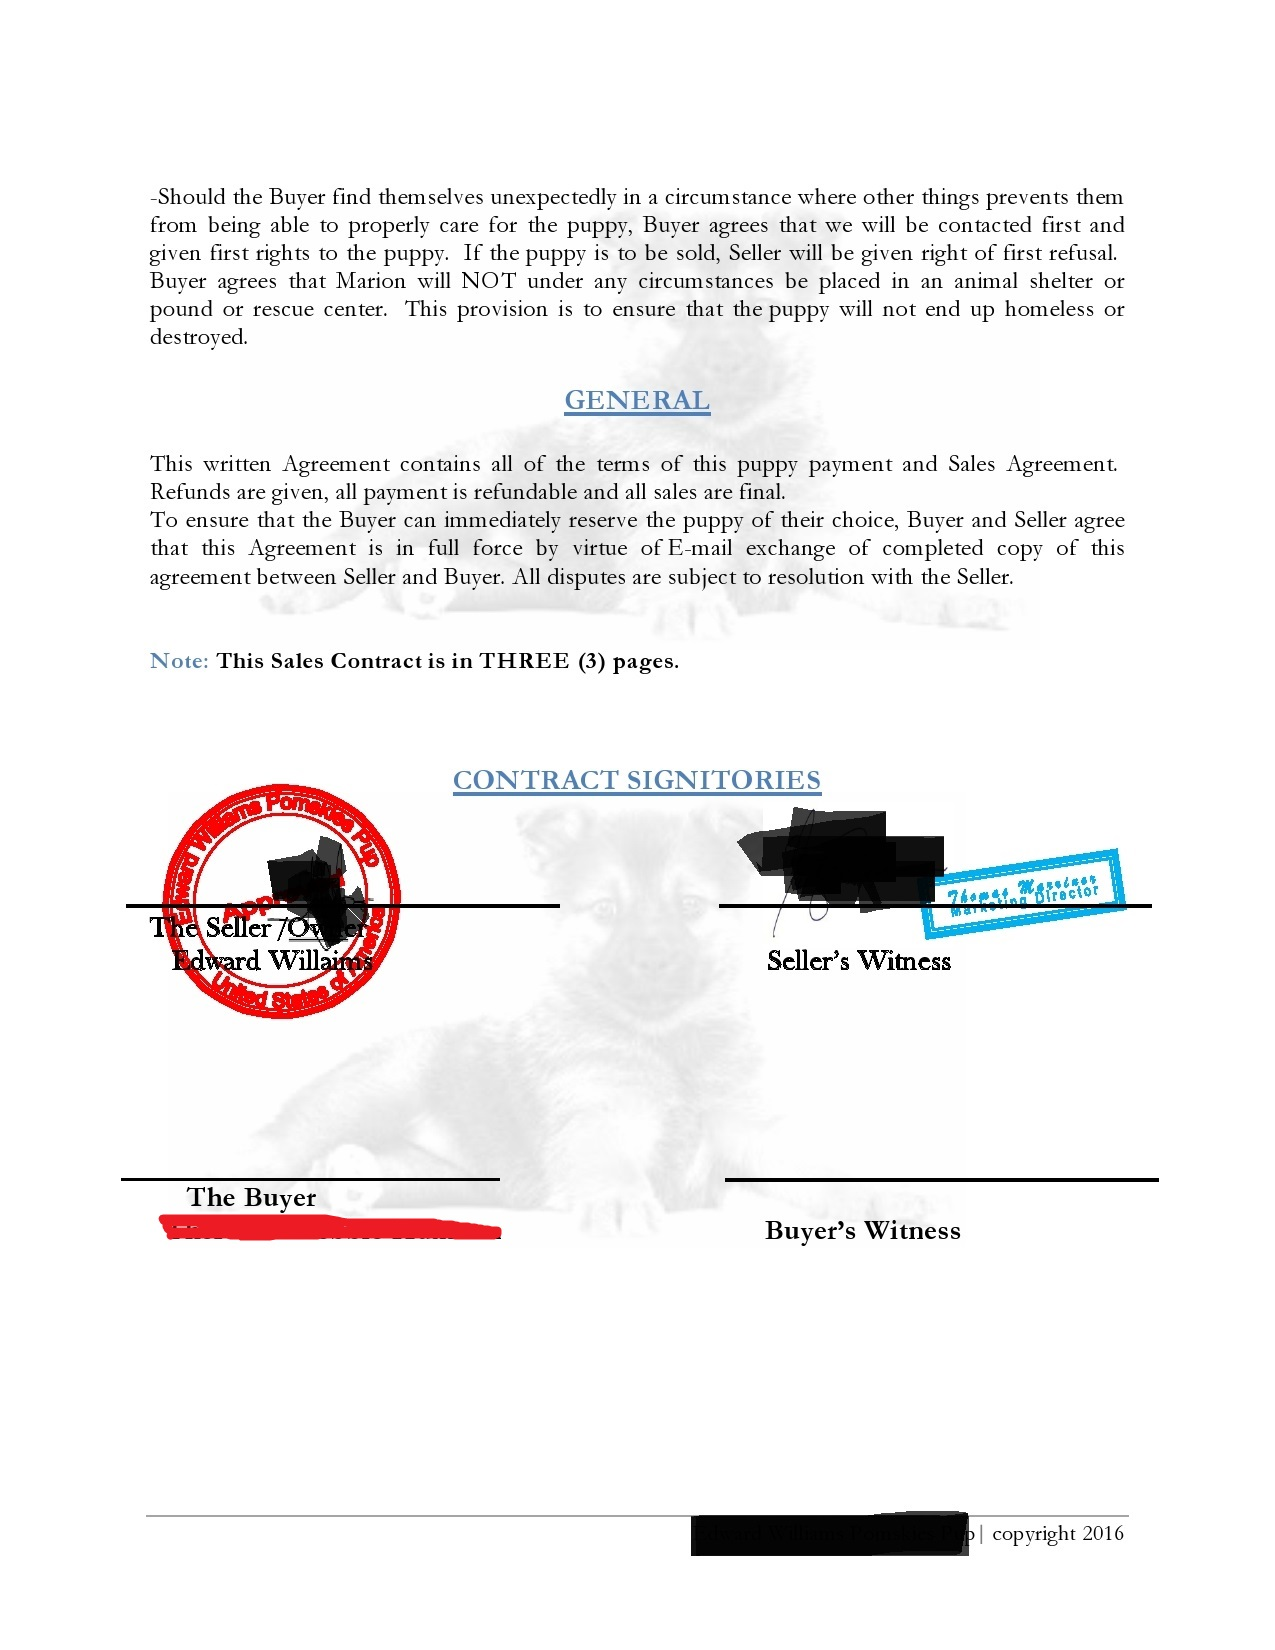 Ed Williams Pomsky Contract